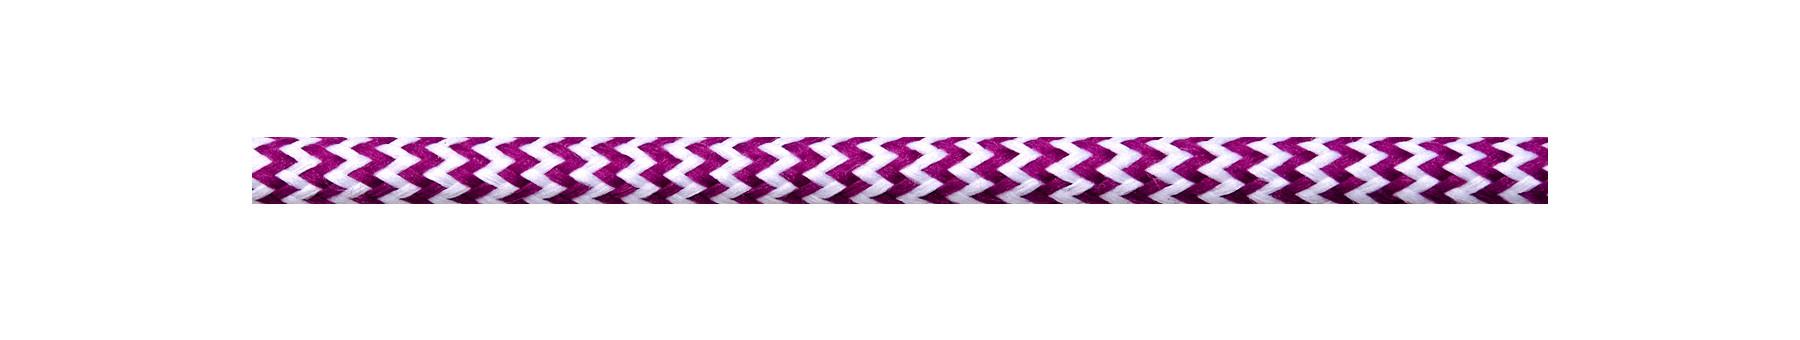 Textile Cable White-Cerise Zig Zag